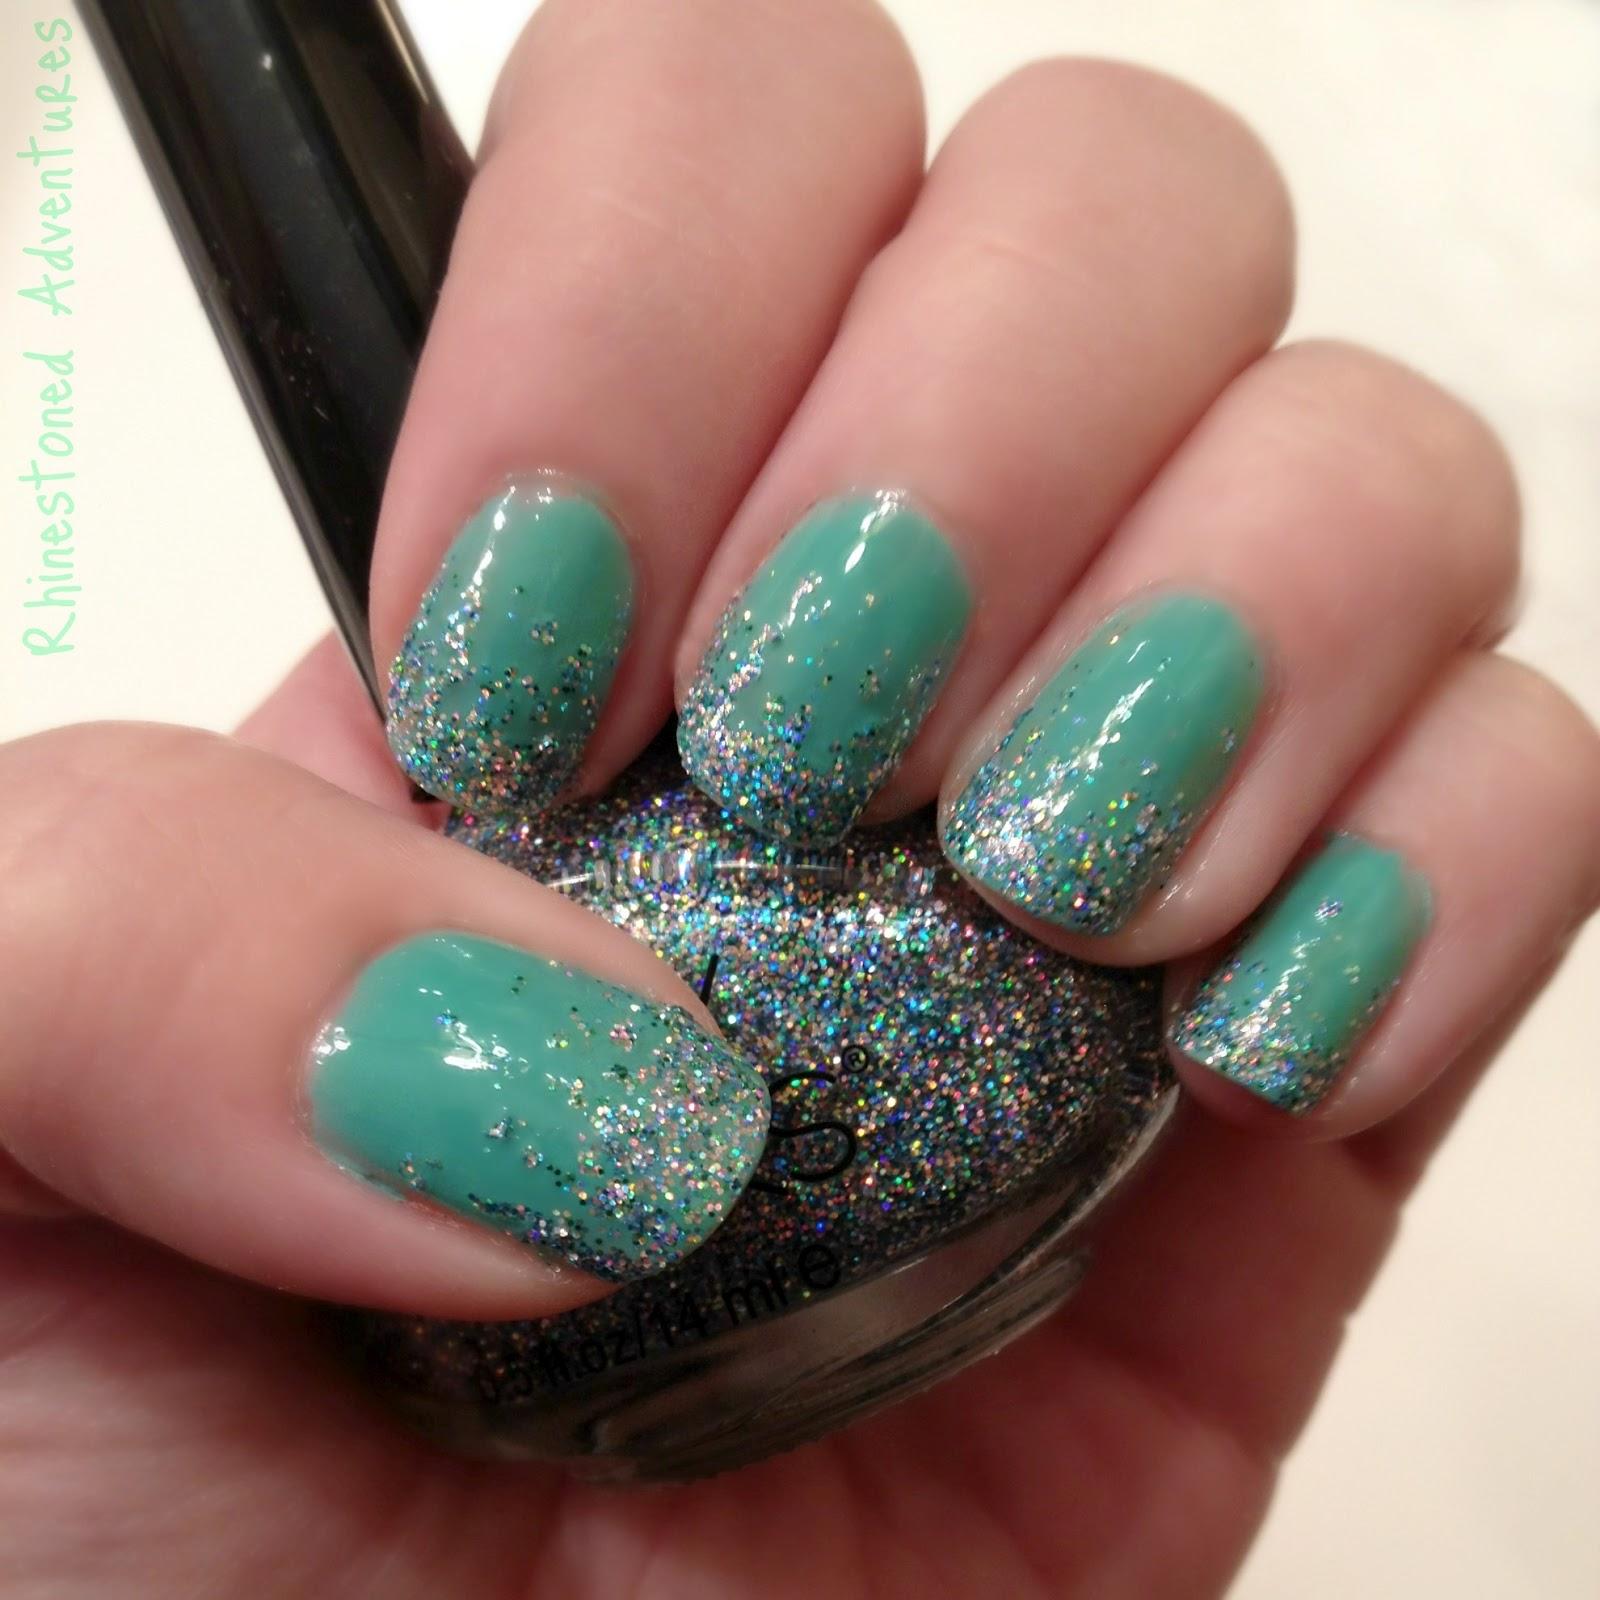 700+ nails mermaid rhinestoned adventures ariel